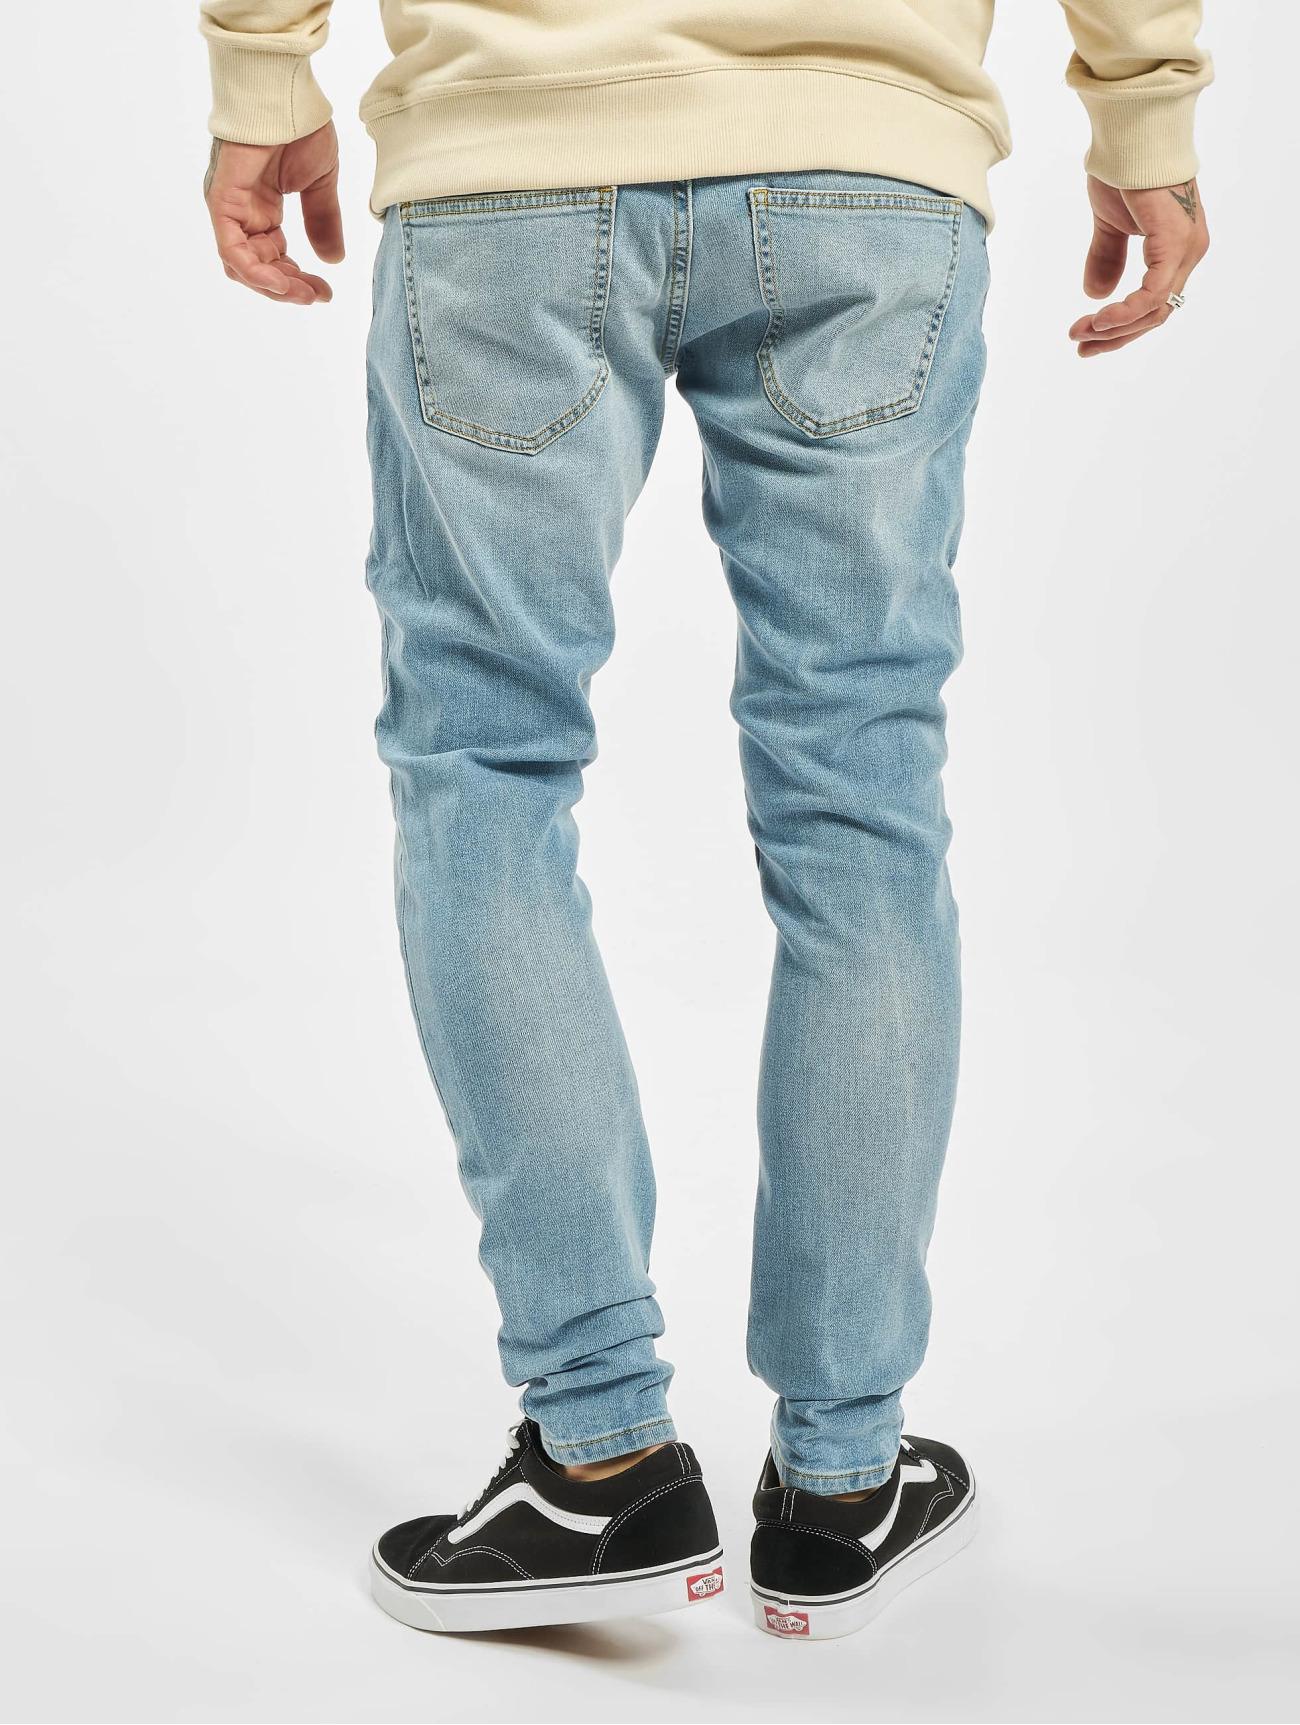 2Y  Anton   bleu Homme Jean slim  716154 Homme Jeans